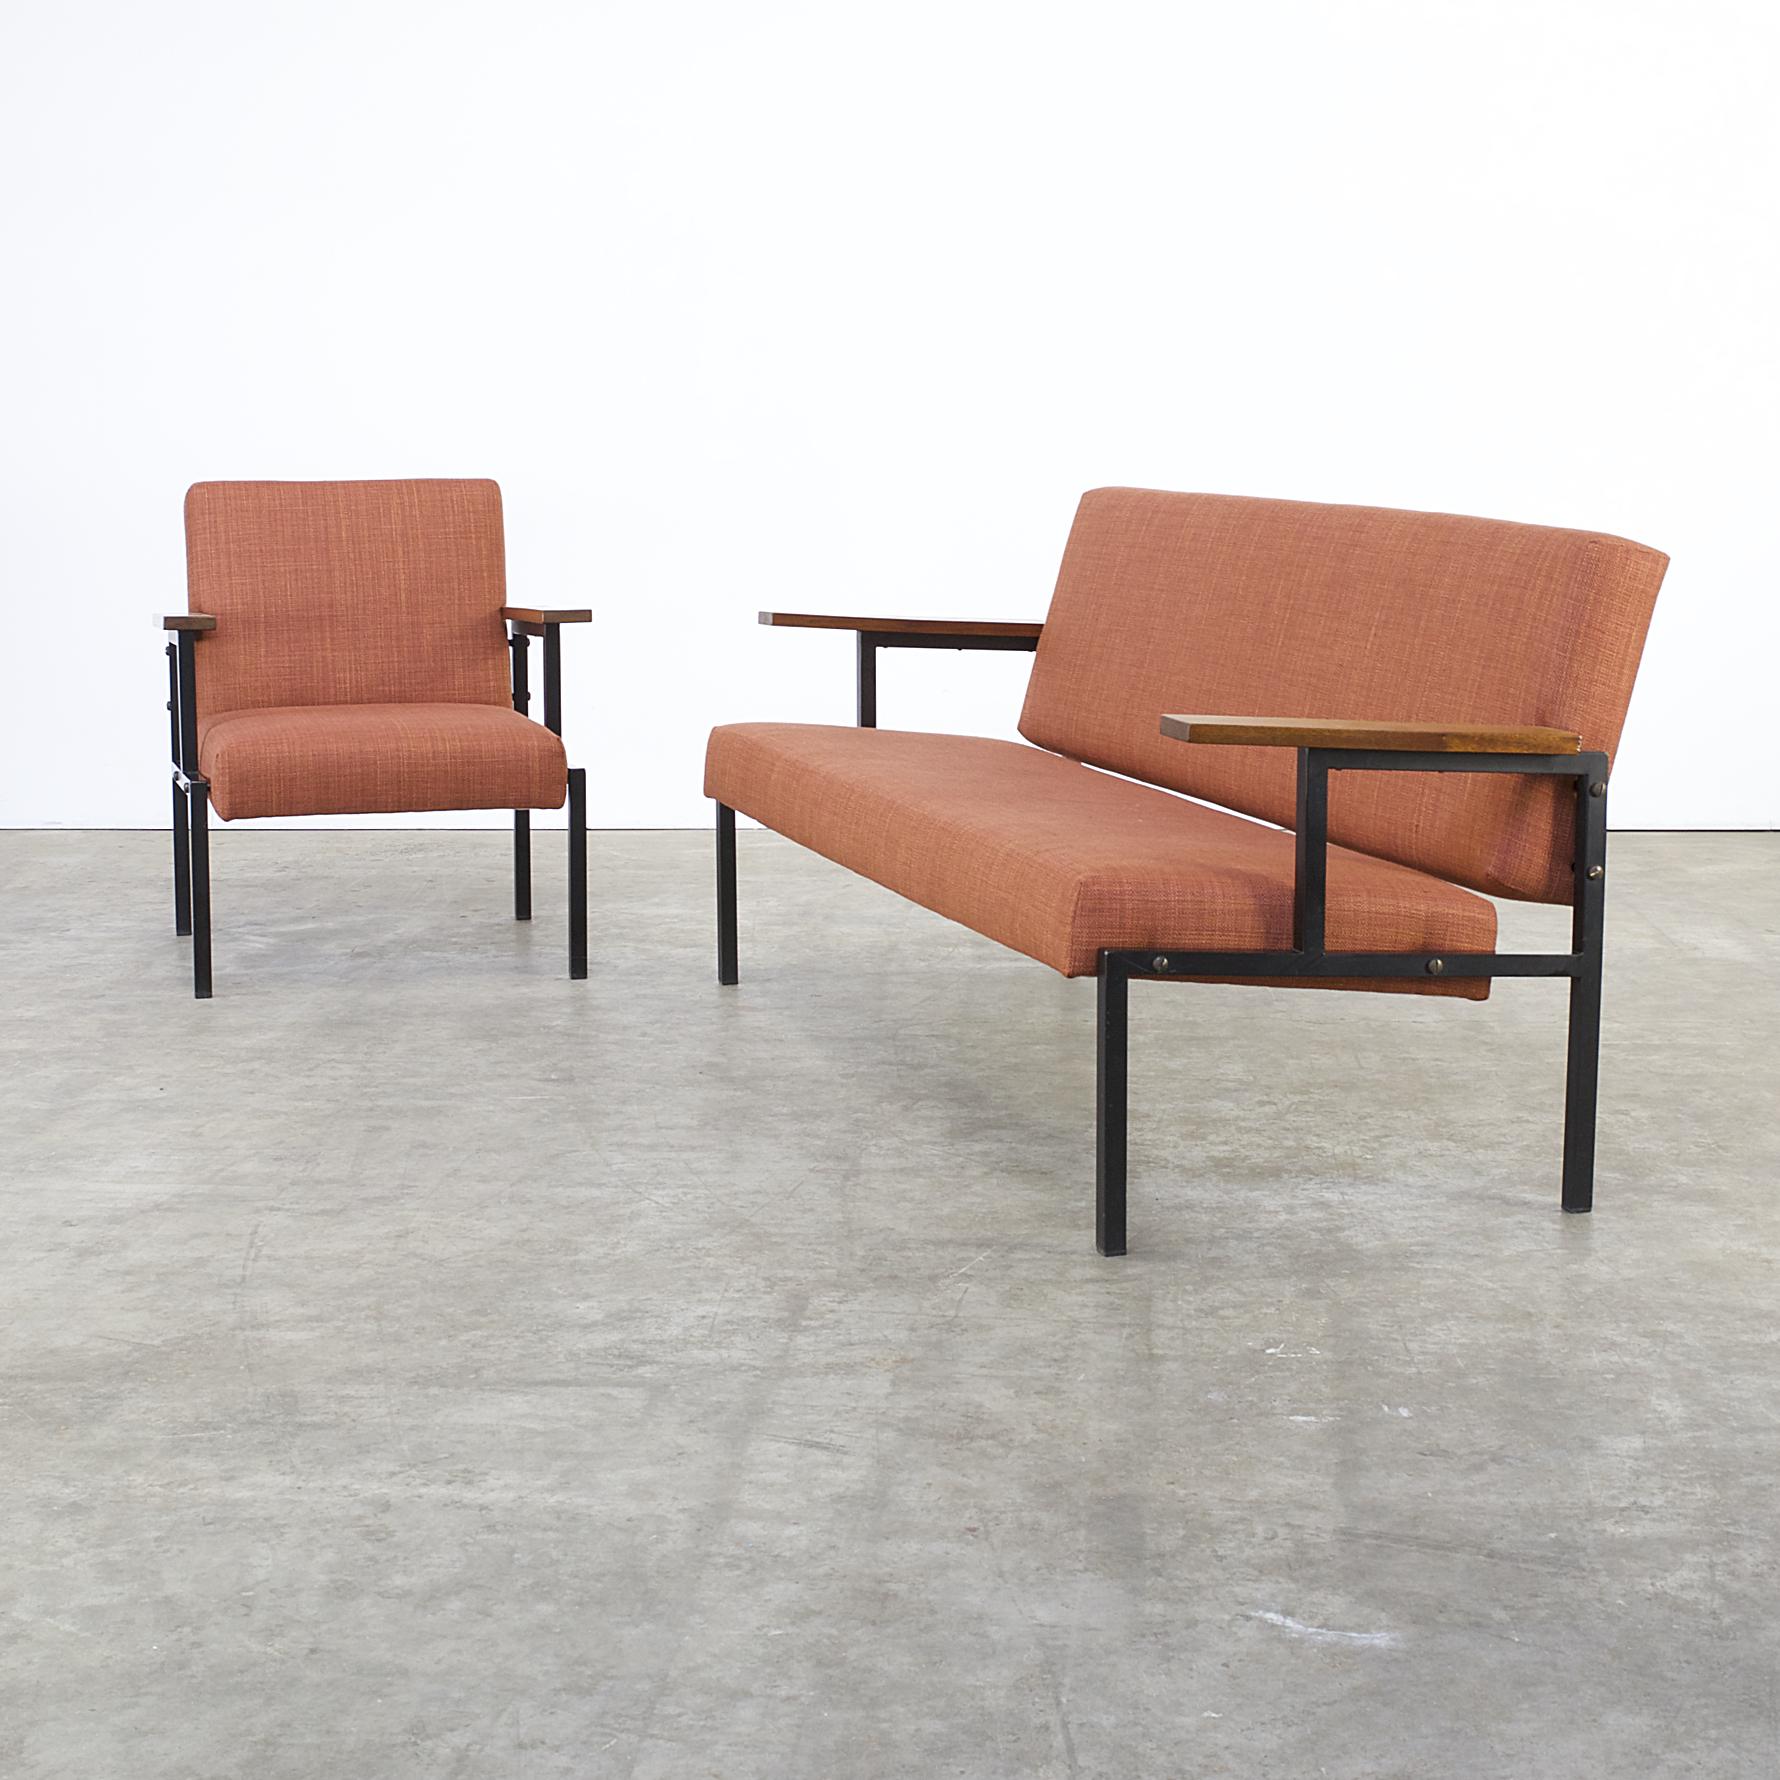 60s seating group 1 sofa 1 fauteuil attr gijs van der sluis barbmama. Black Bedroom Furniture Sets. Home Design Ideas